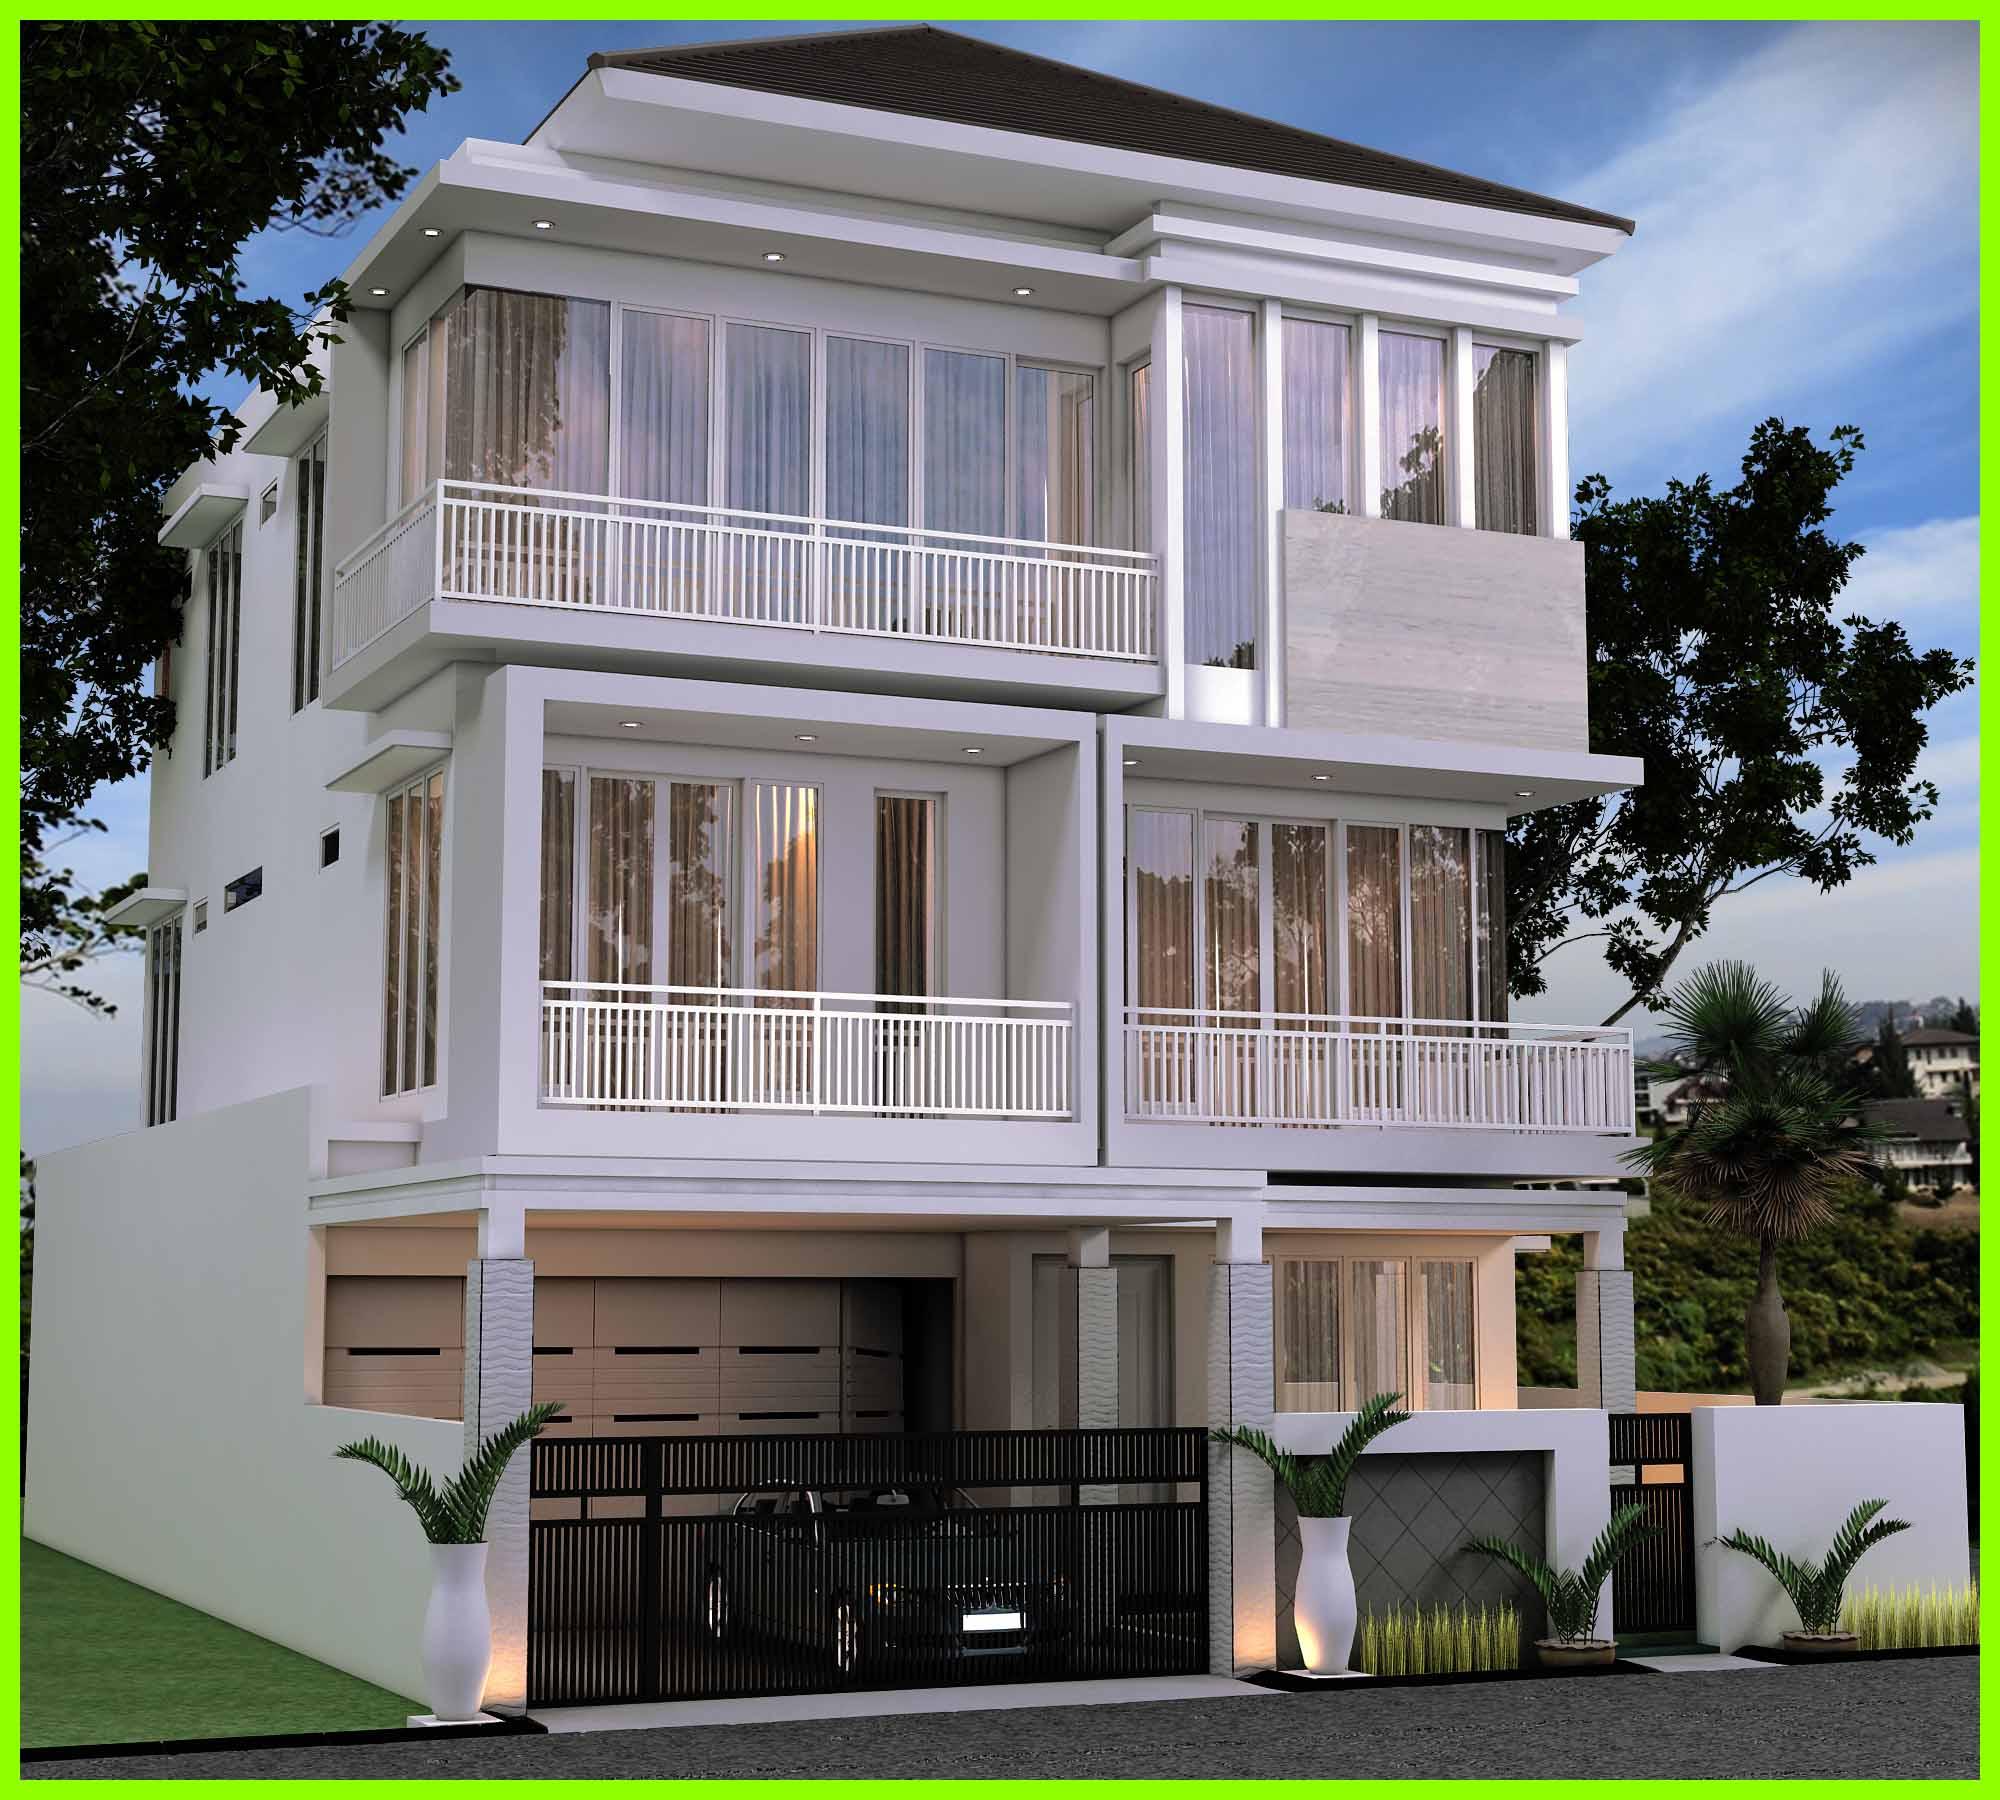 70 Desain Rumah Mewah Minimalis Modern 2 Lantai Desain